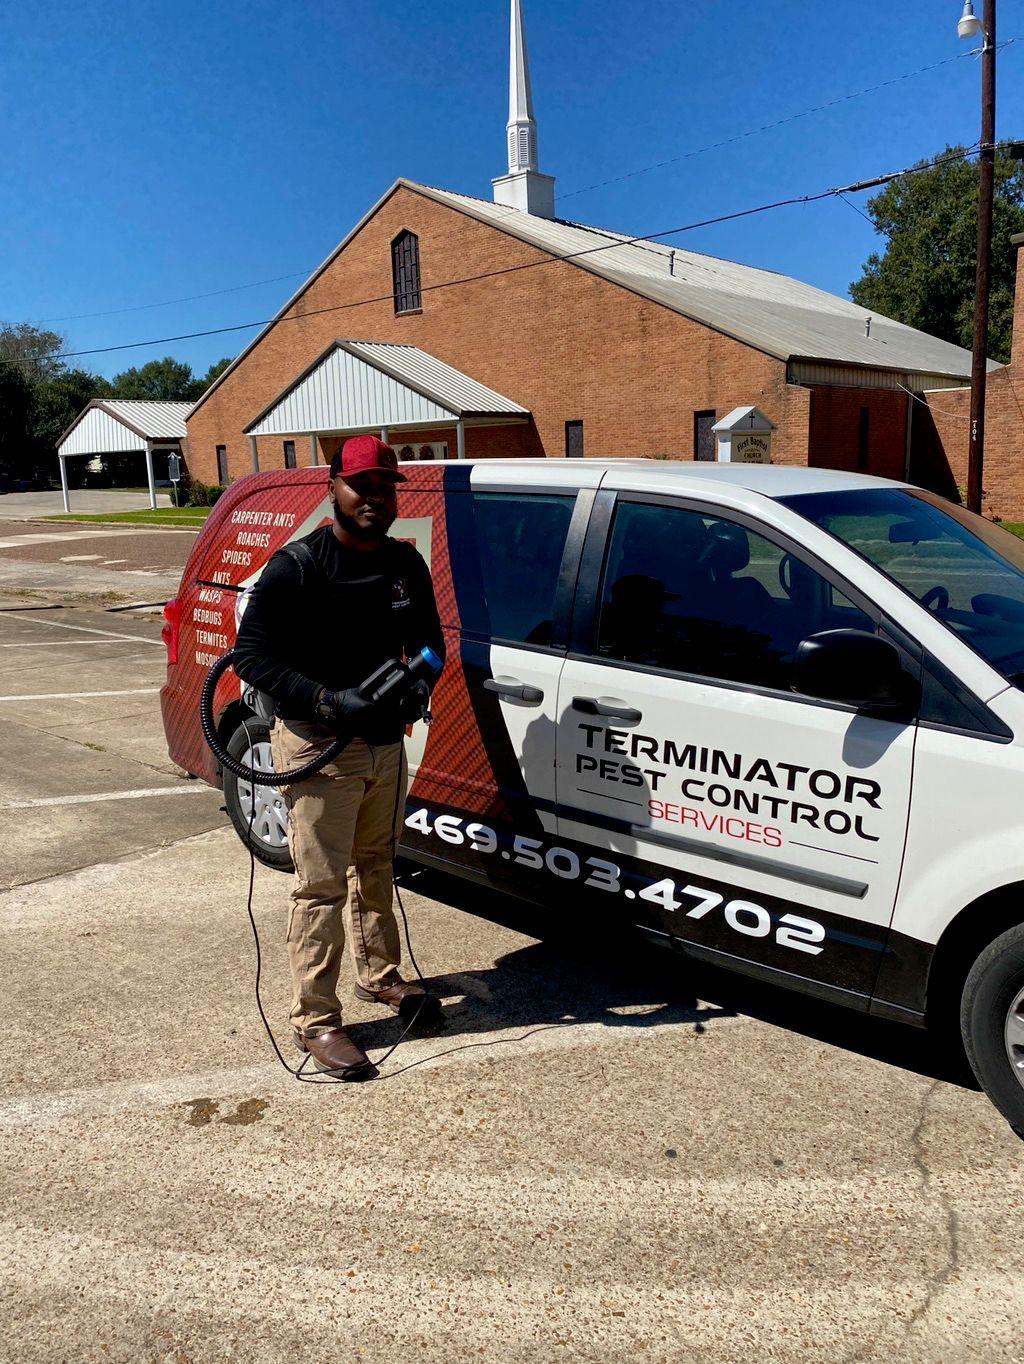 Terminator Pest Control Services